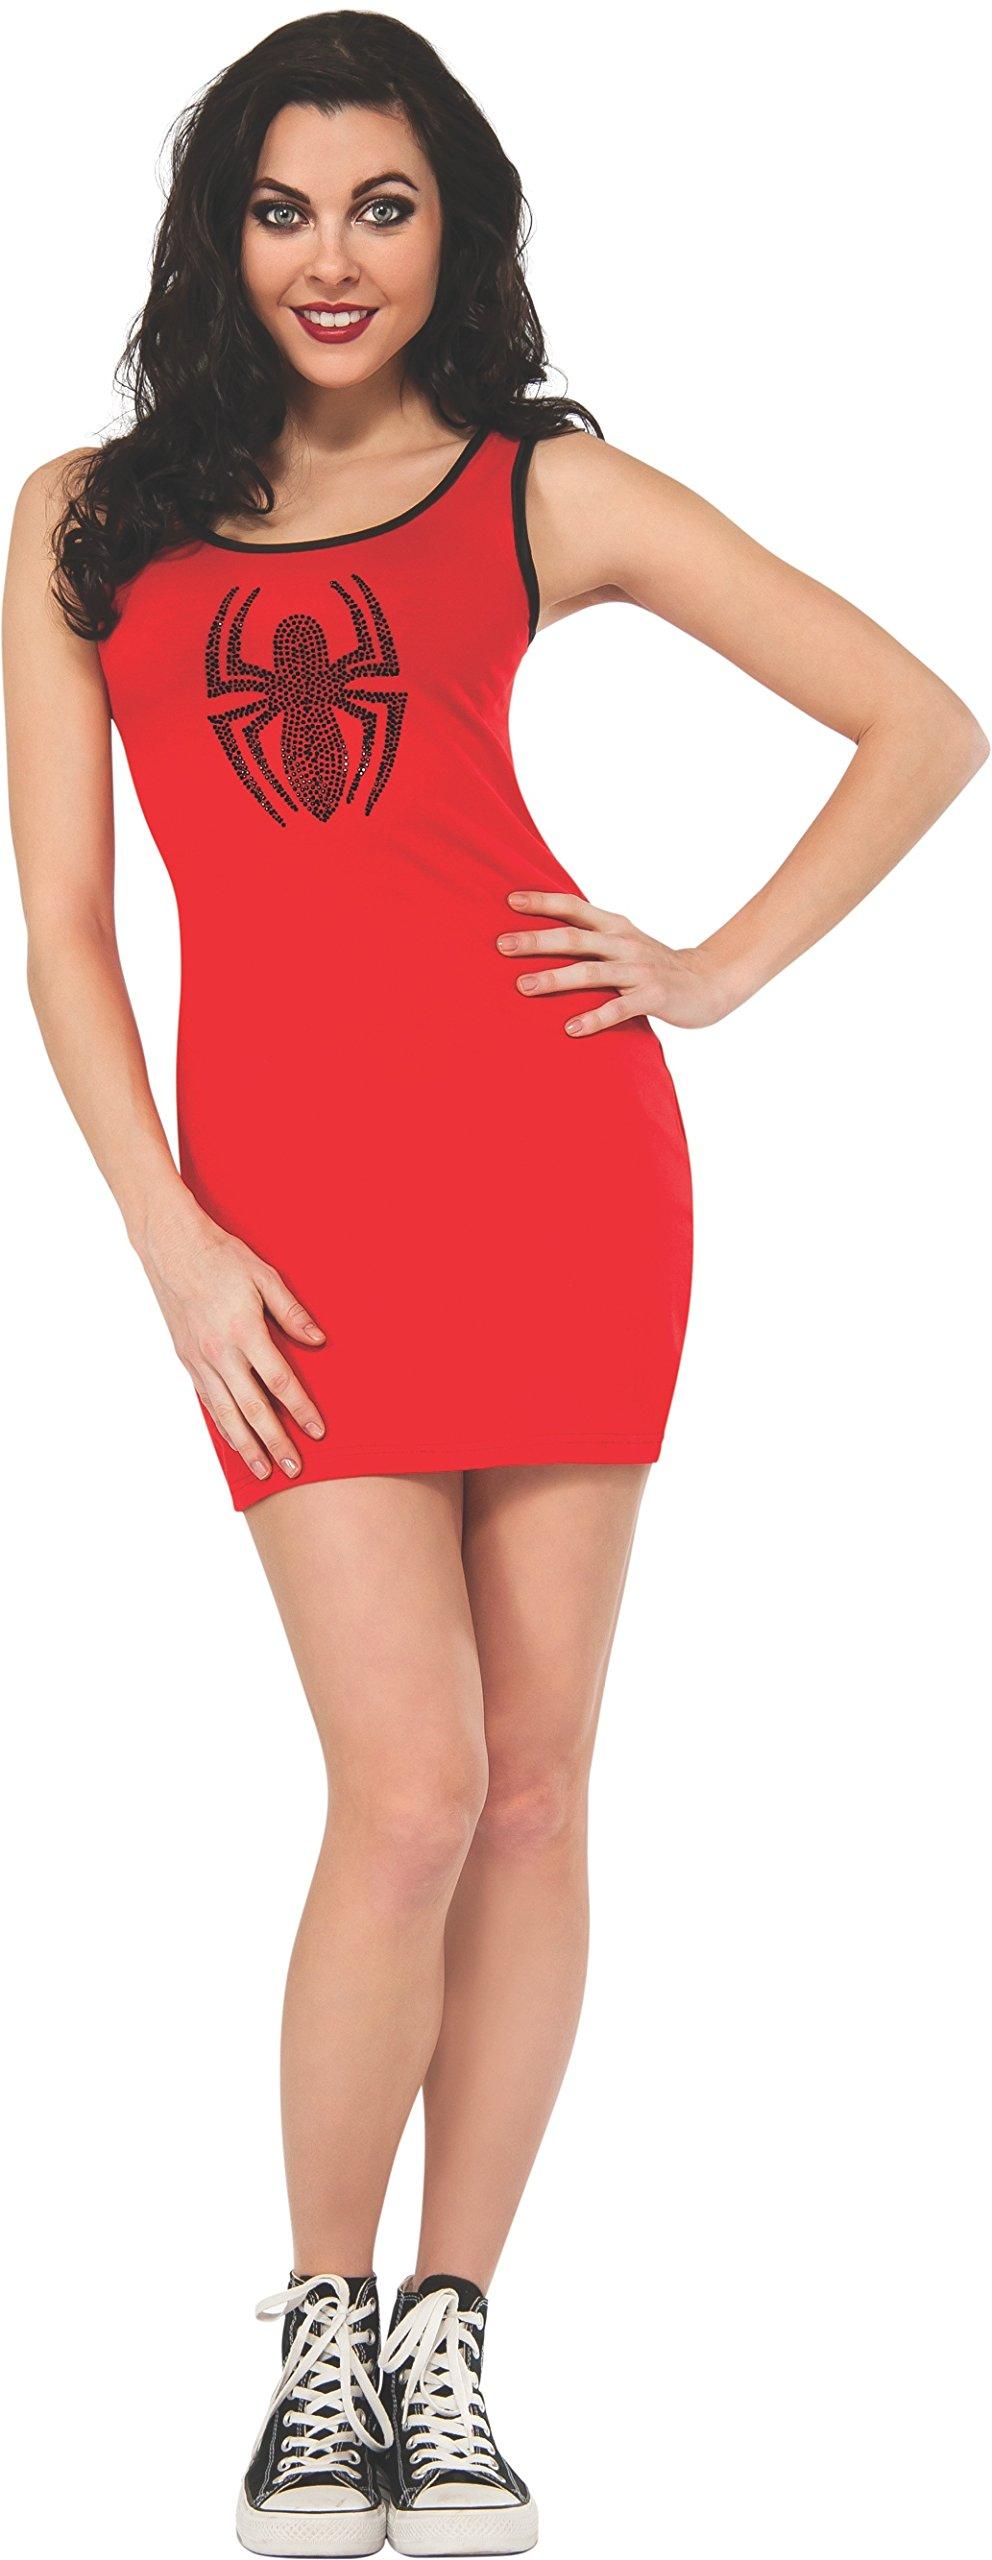 - 71lgxt QMIL - Marvel Rubie's Costume Women's Universe Adult Spidergirl Rhinestone Tank Dress